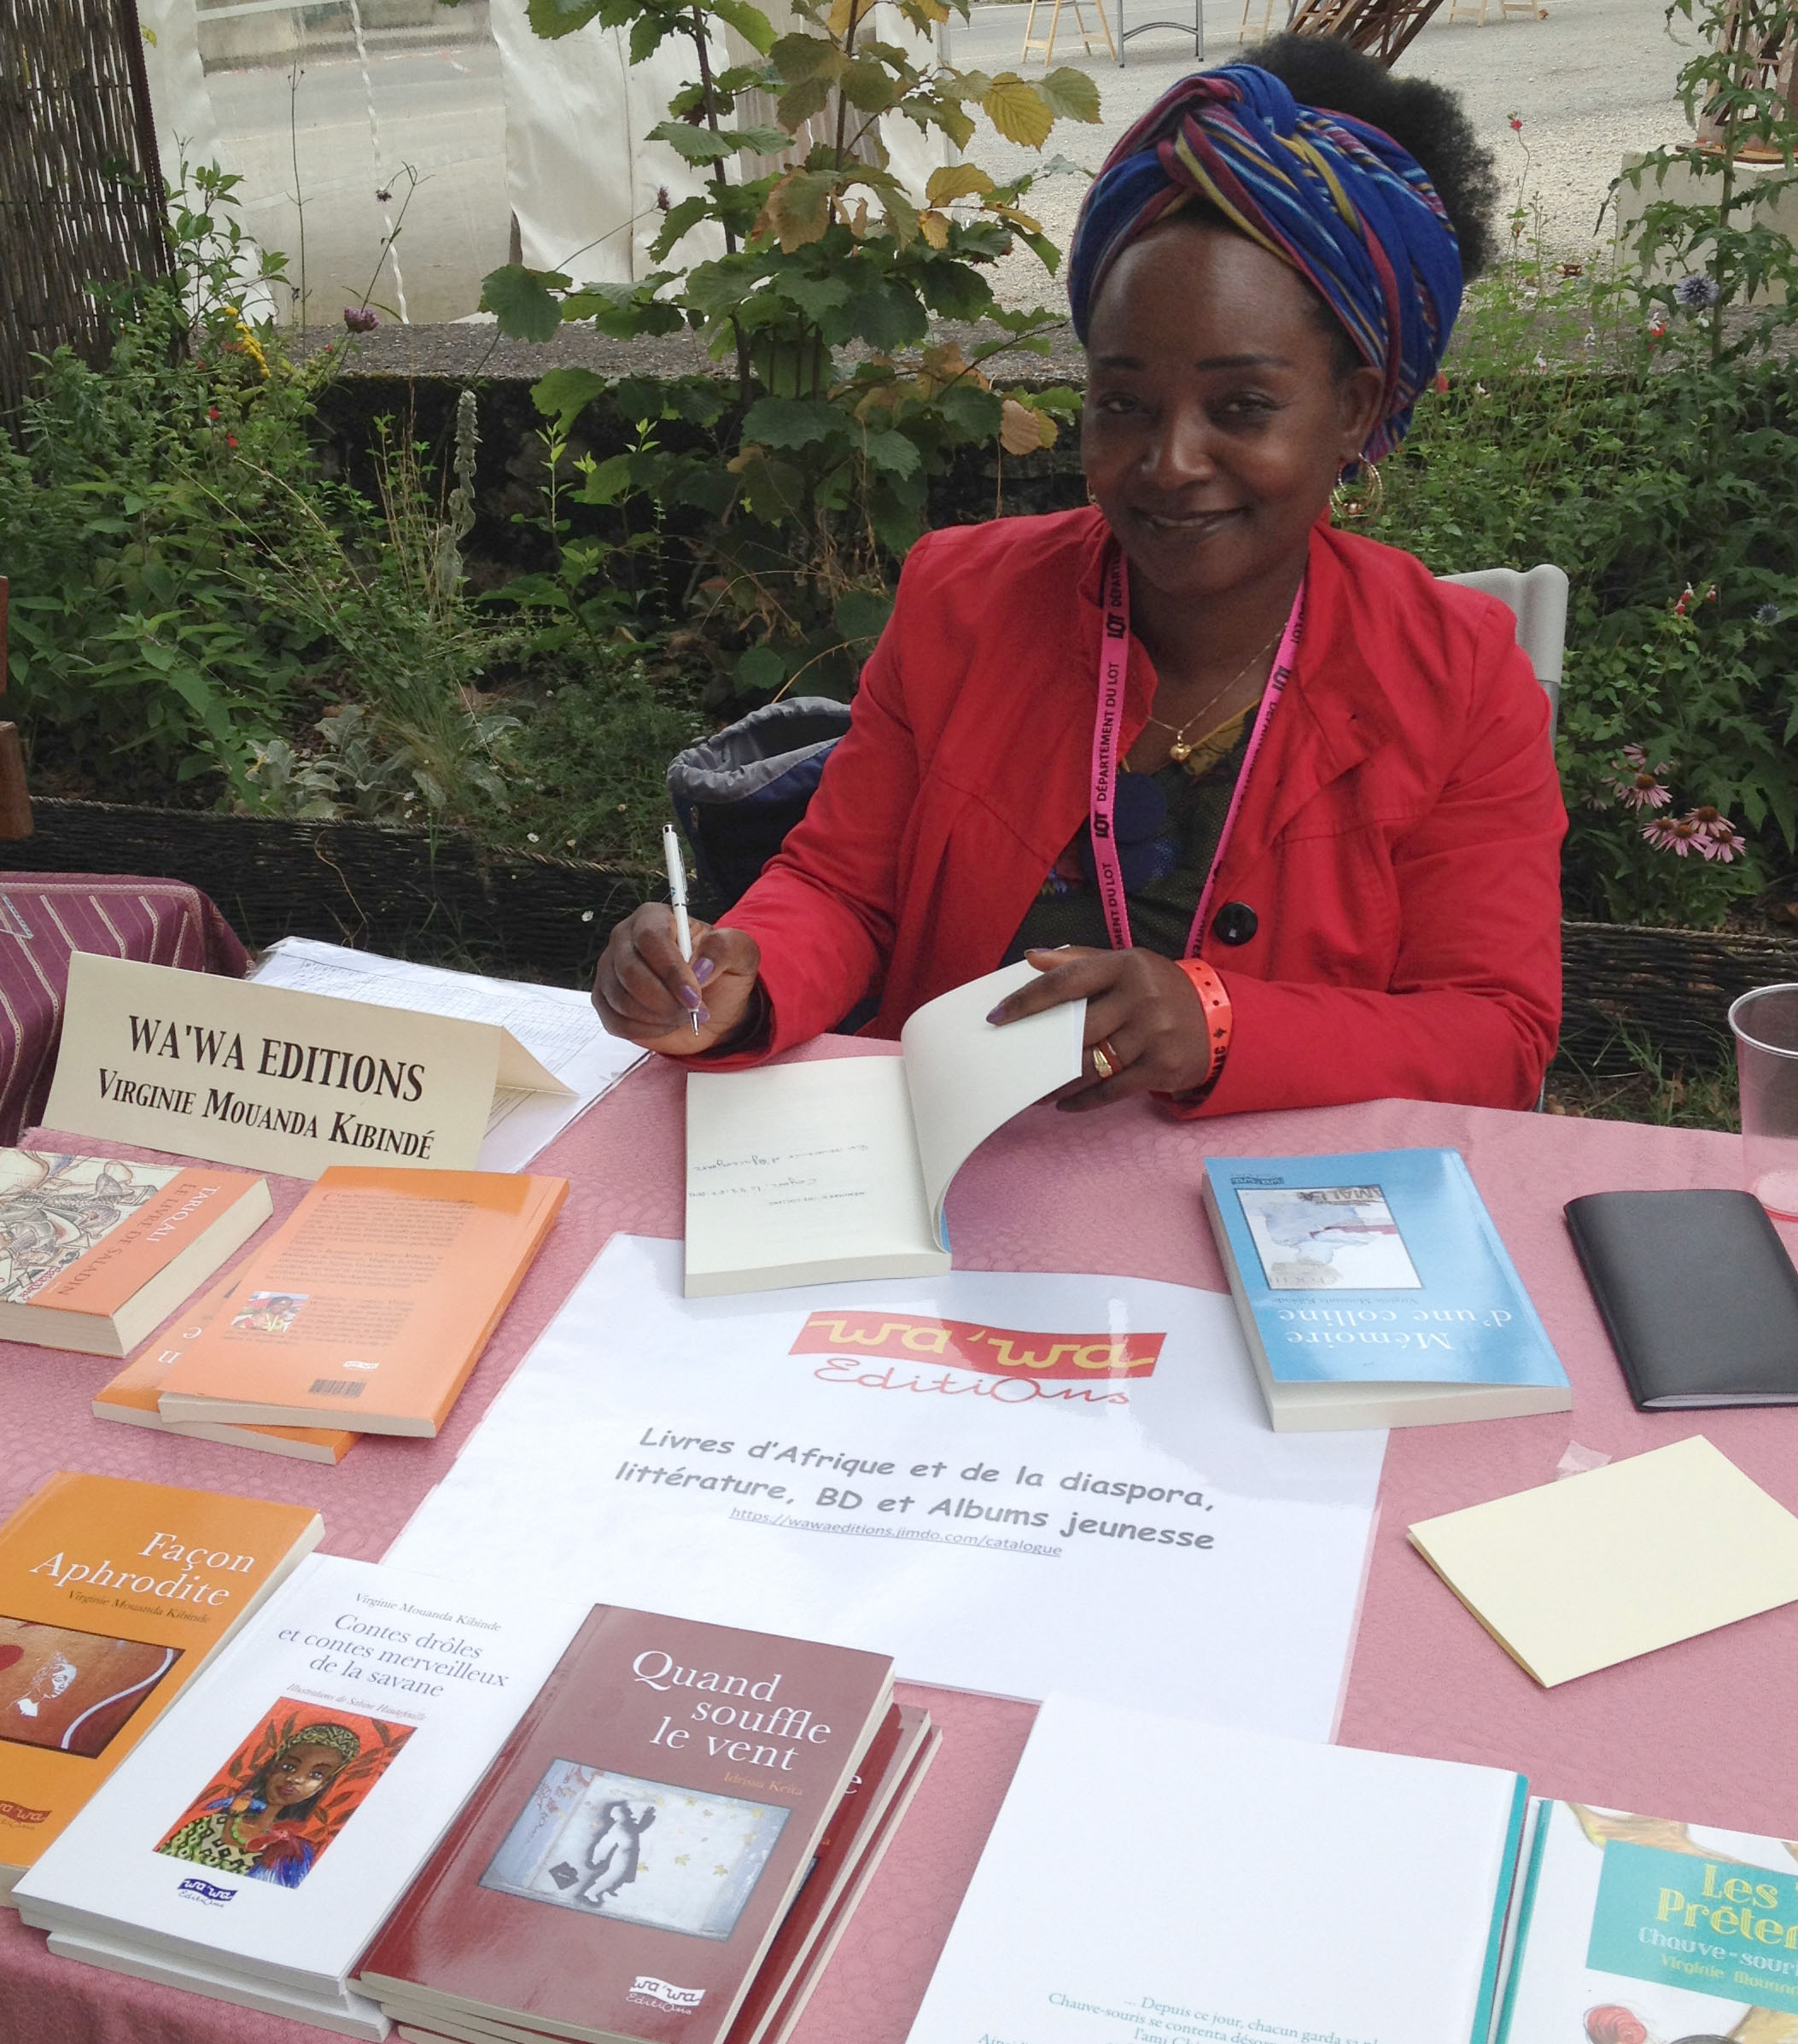 Virginie Mouanda Kibindé